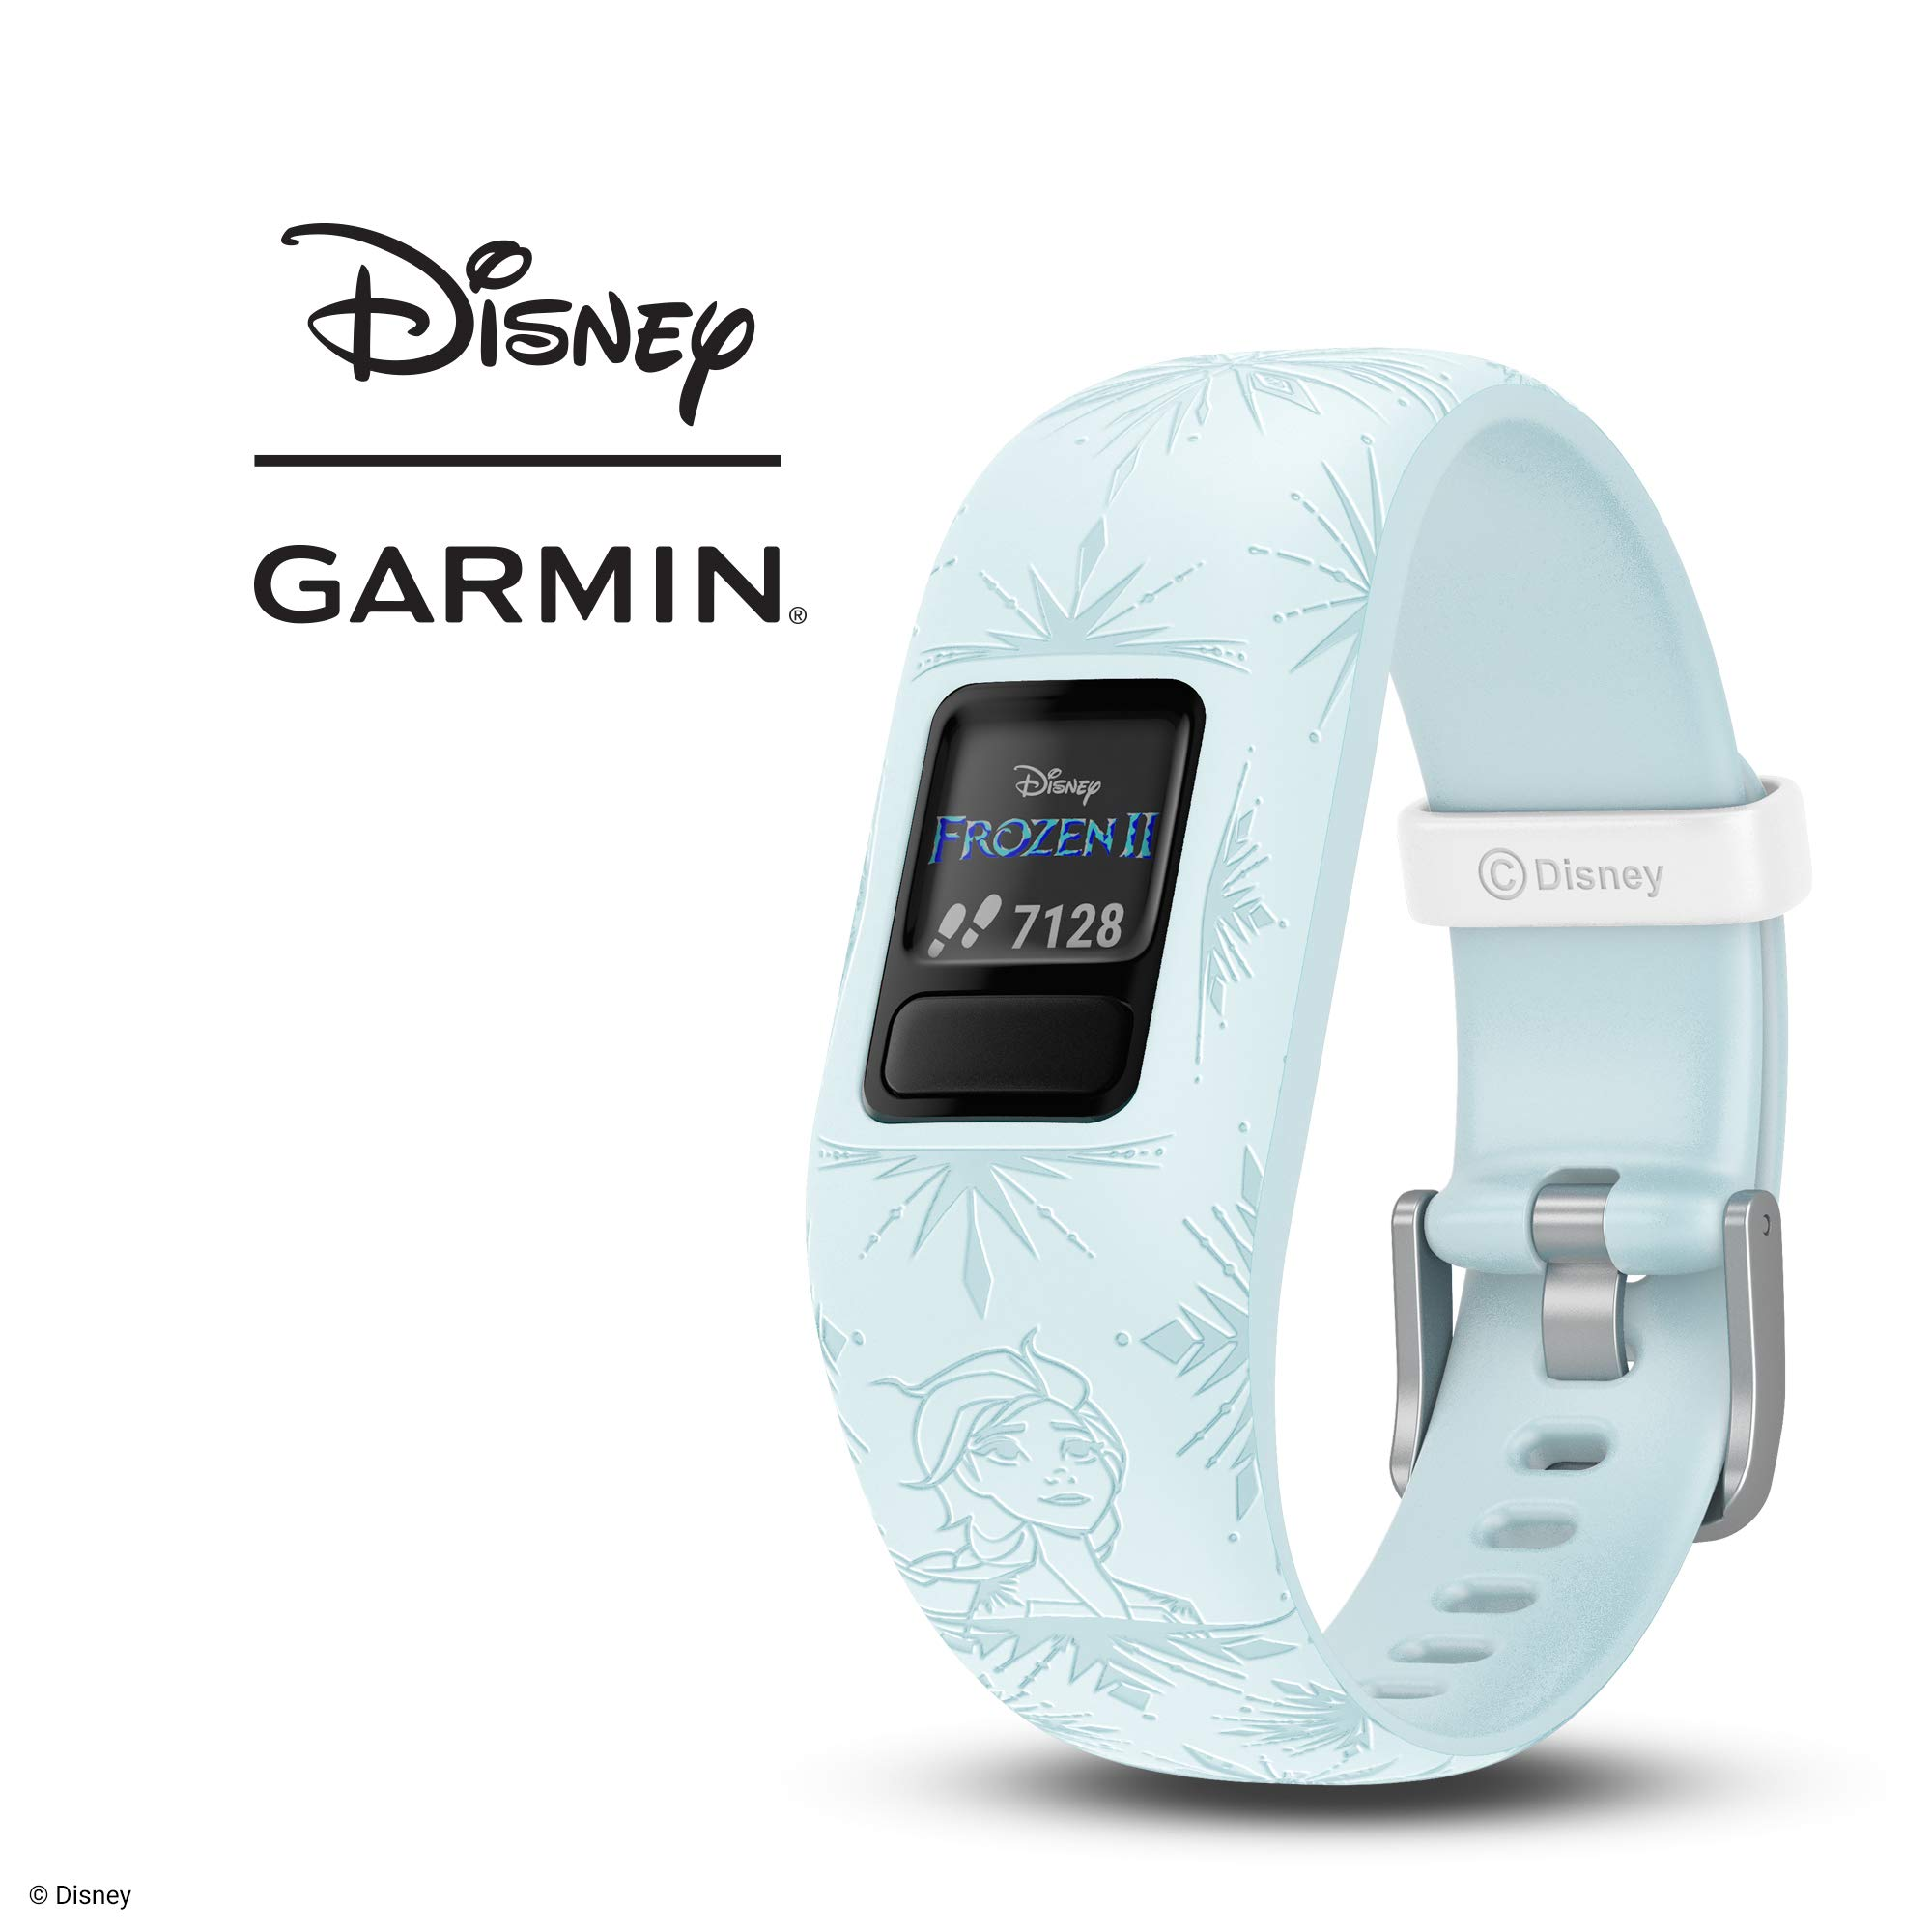 Garmin vívofit Jr 2, Kids Fitness/Activity Tracker, 1-Year Battery Life, Adjustable Band, Disney Frozen 2, Elsa, Light Blue by Garmin